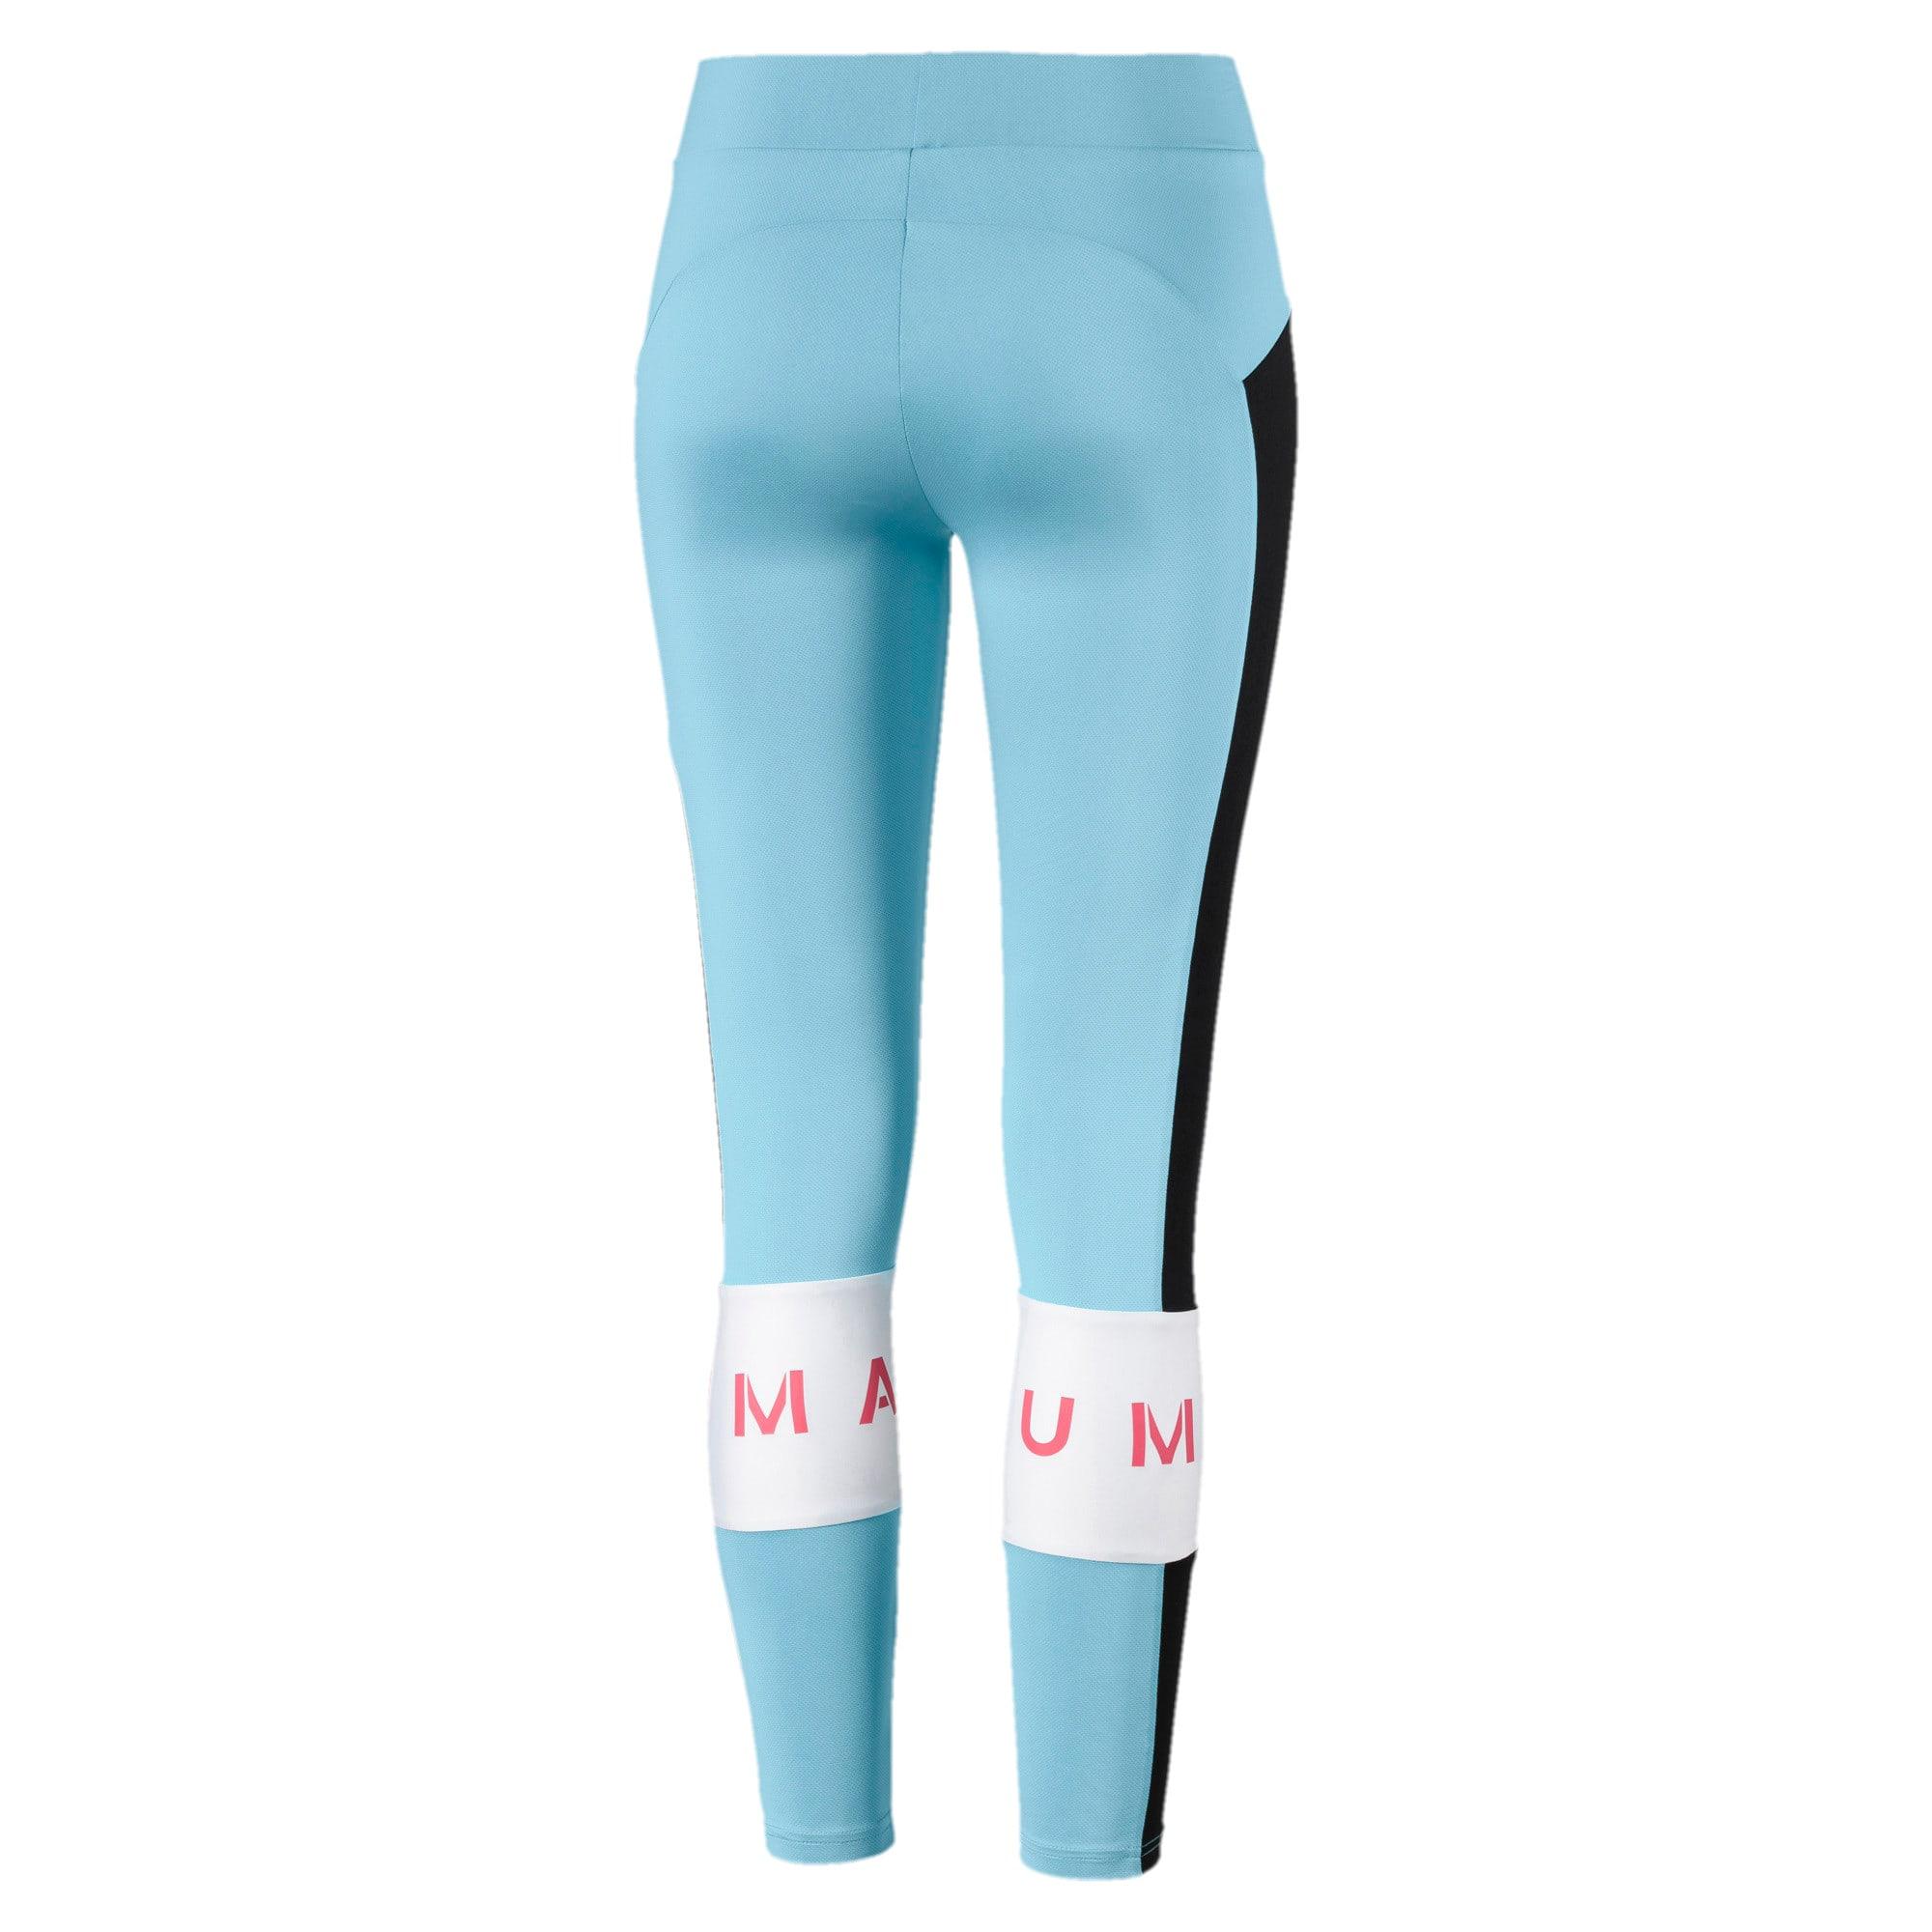 Thumbnail 5 van PUMA XTG legging voor vrouwen, Milky Blue, medium